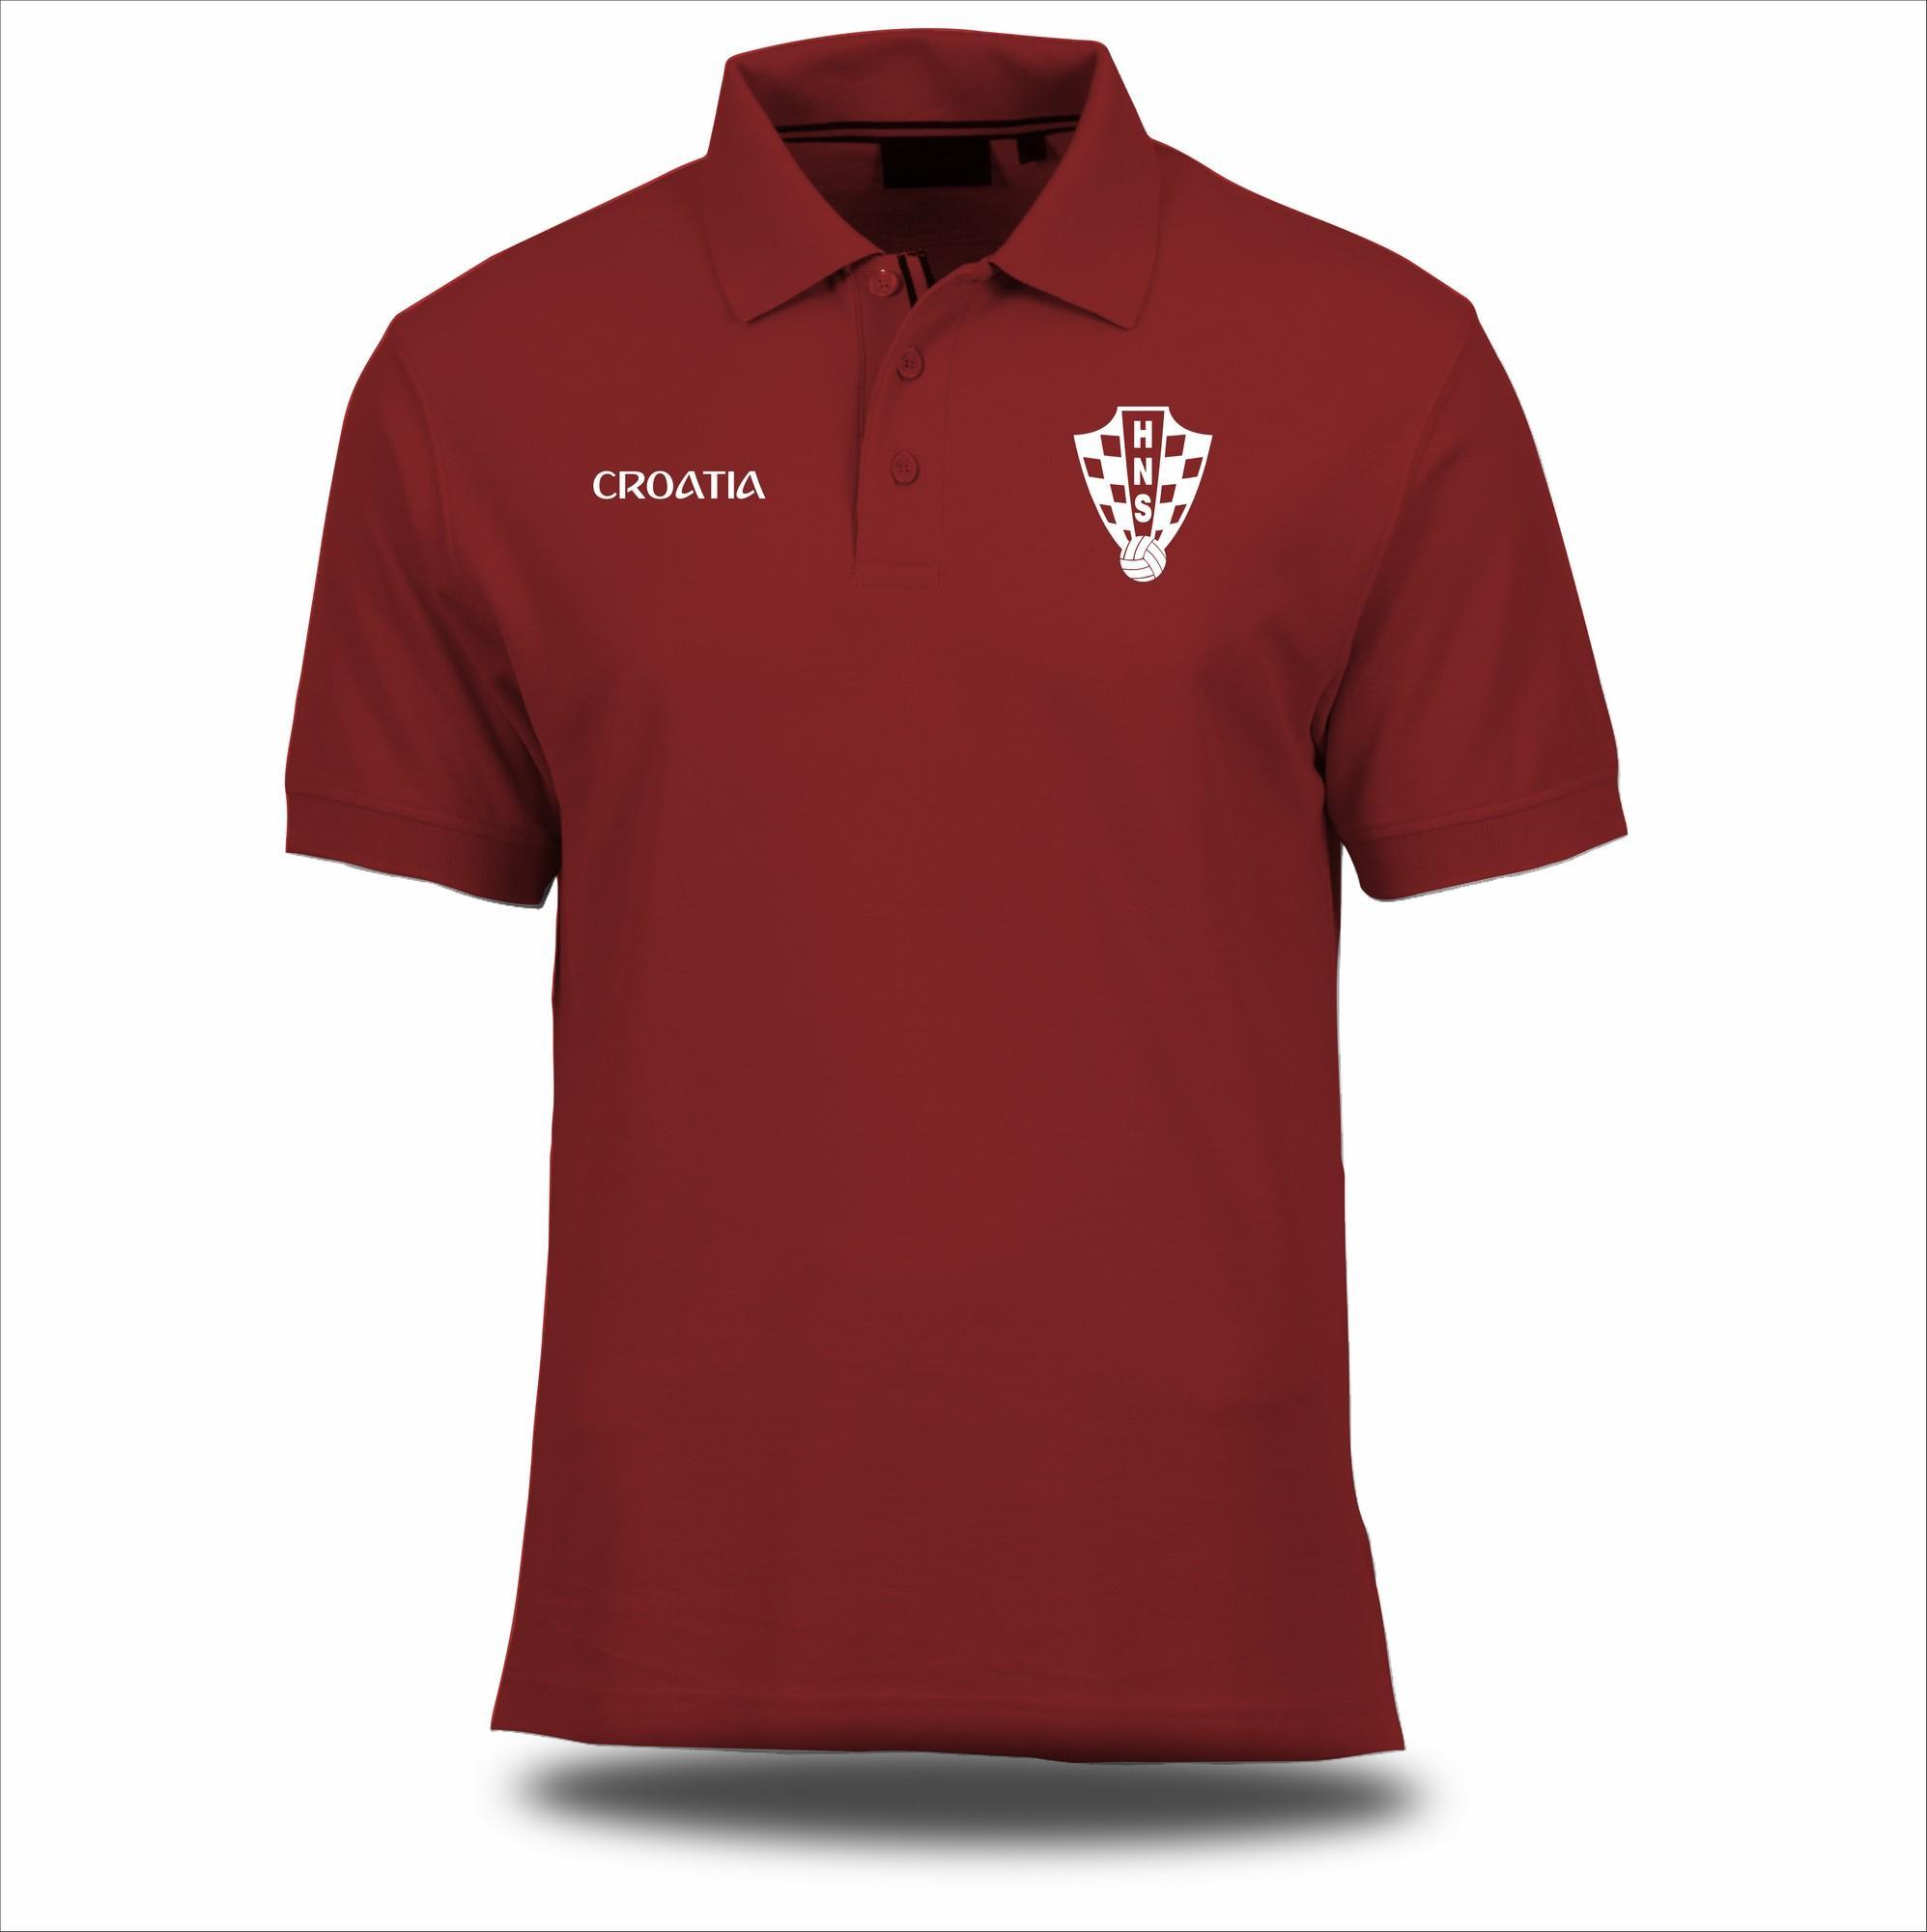 Jersey Ori World Cup Kroasia Croatia 2018 Russia Rusia Polo Shirt Kaos Kerah Bahan Lacoste Premium Murah Pria Wanita Terbaru